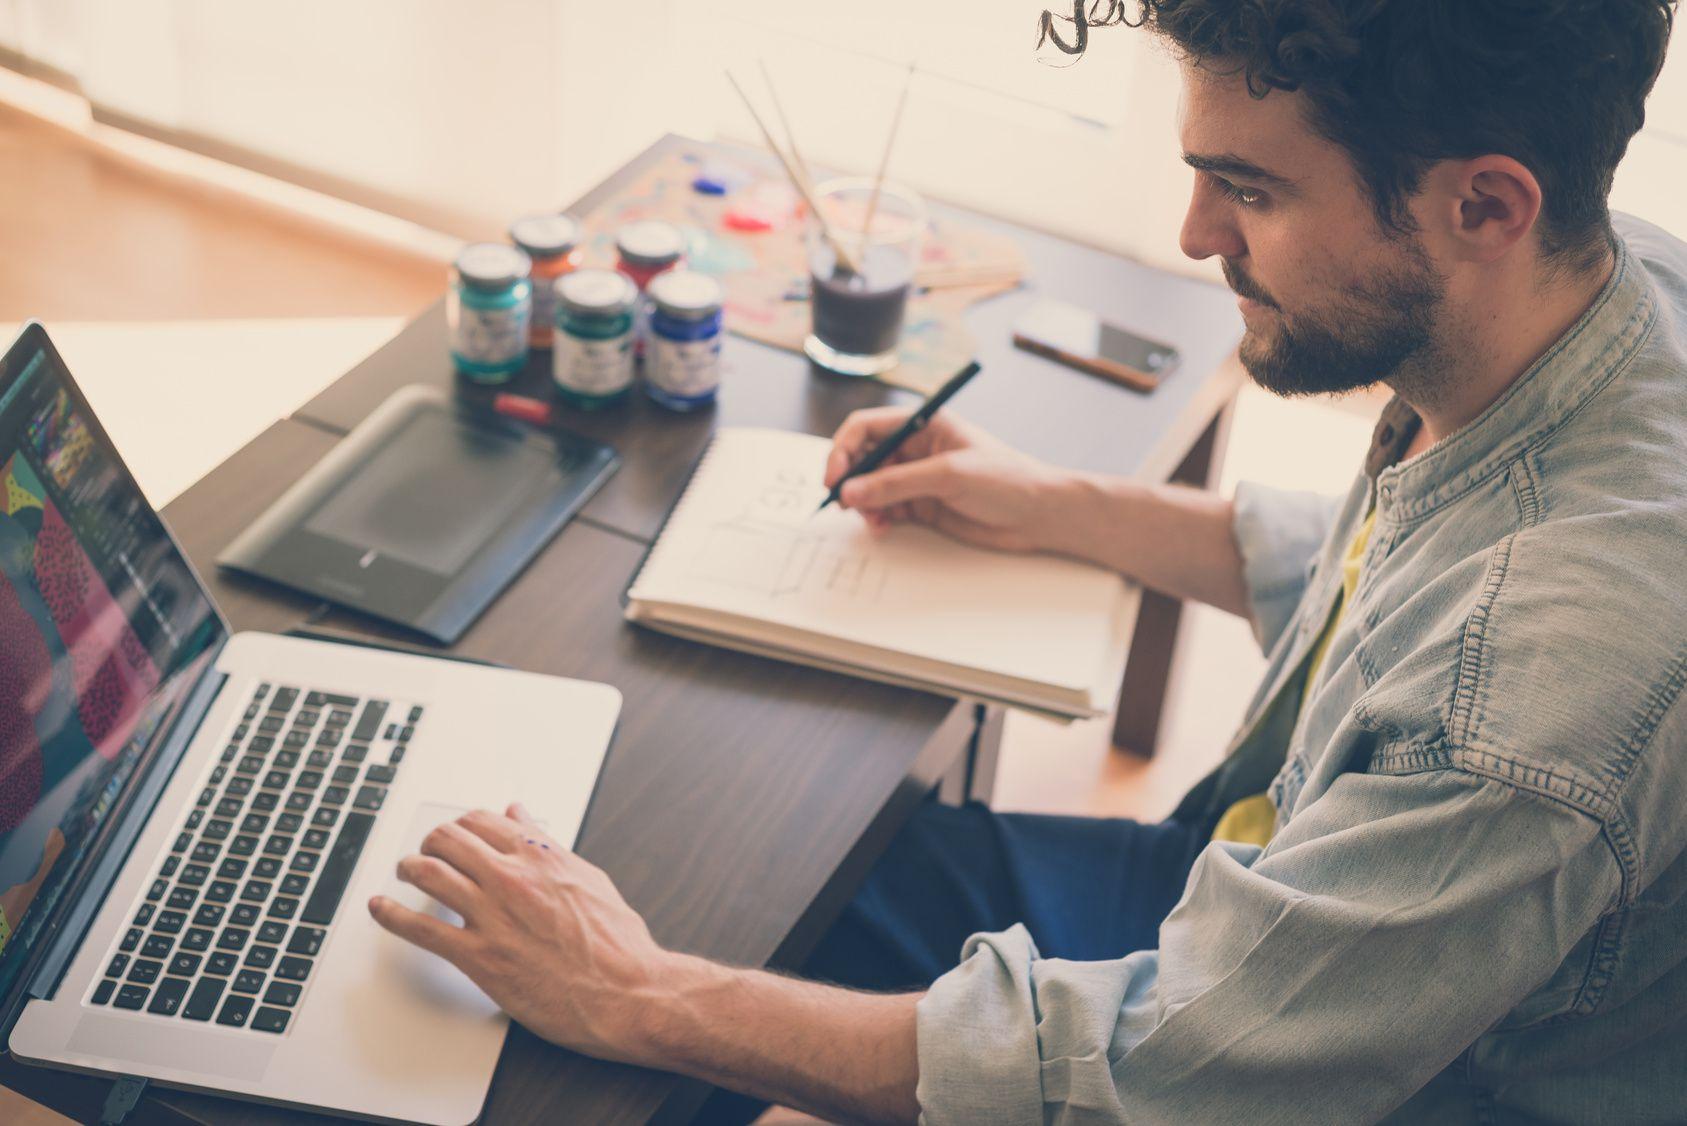 man making notes and using laptop